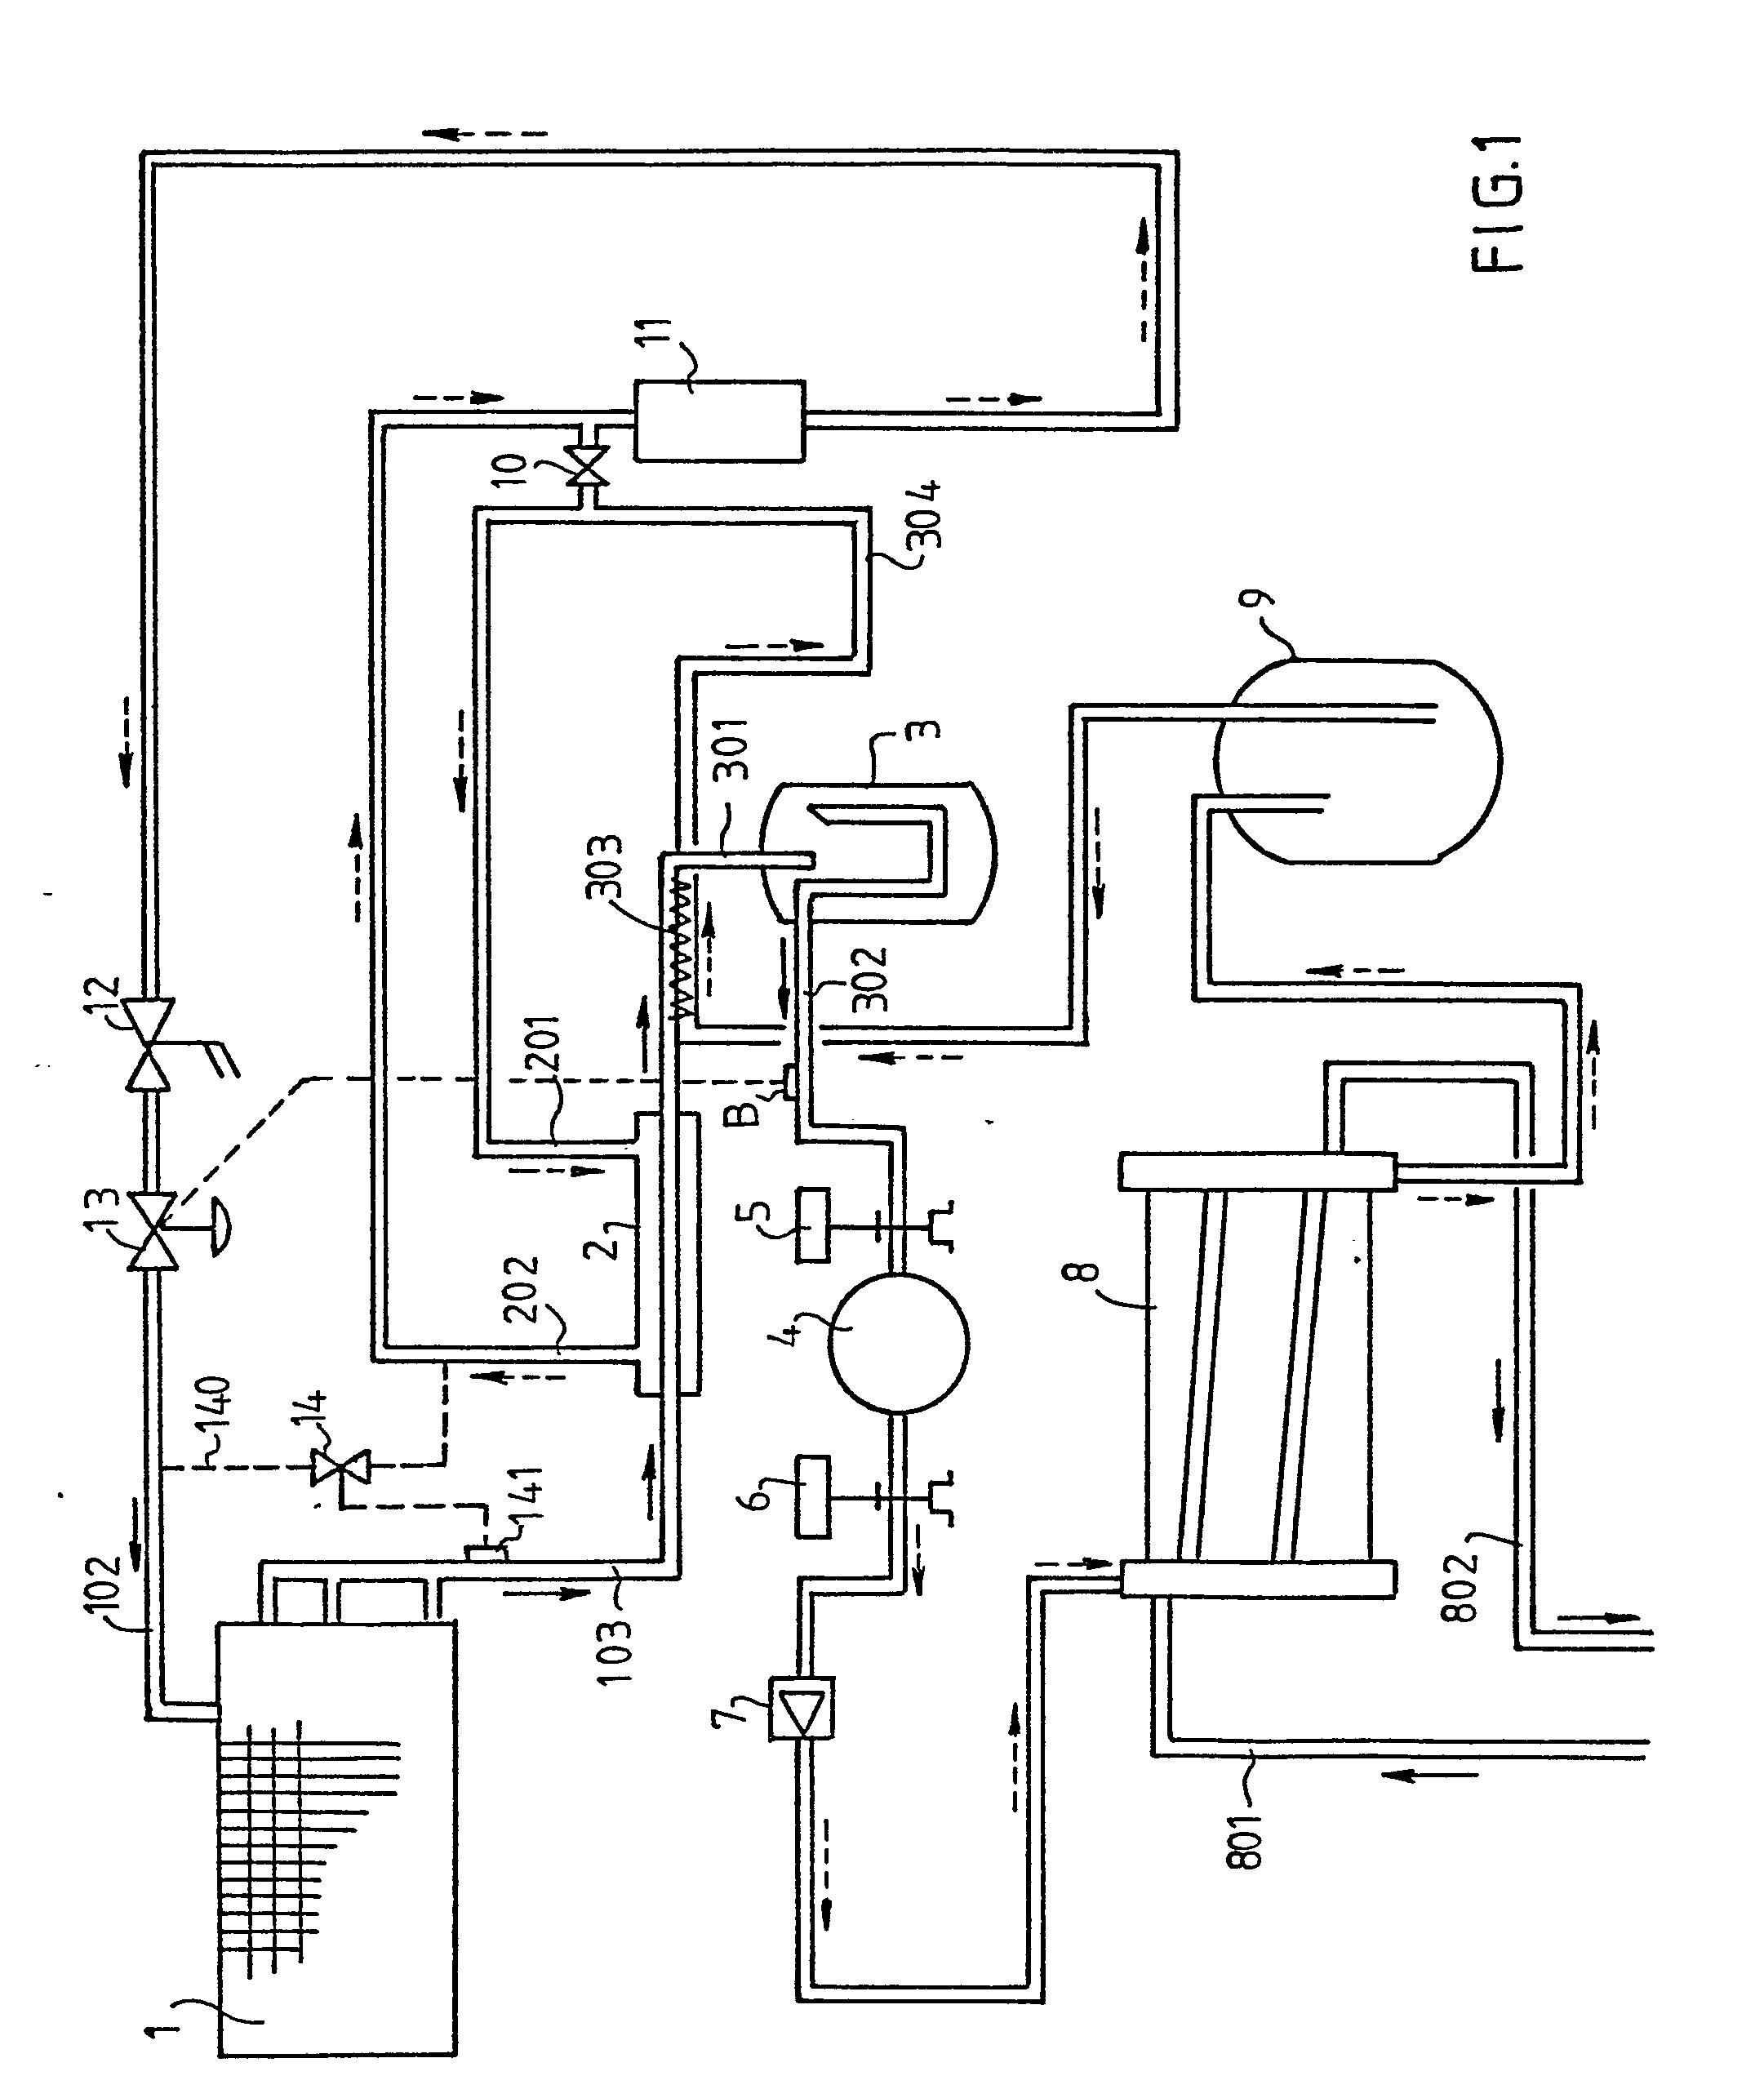 patent ep0156707a1 installation de climatisation. Black Bedroom Furniture Sets. Home Design Ideas